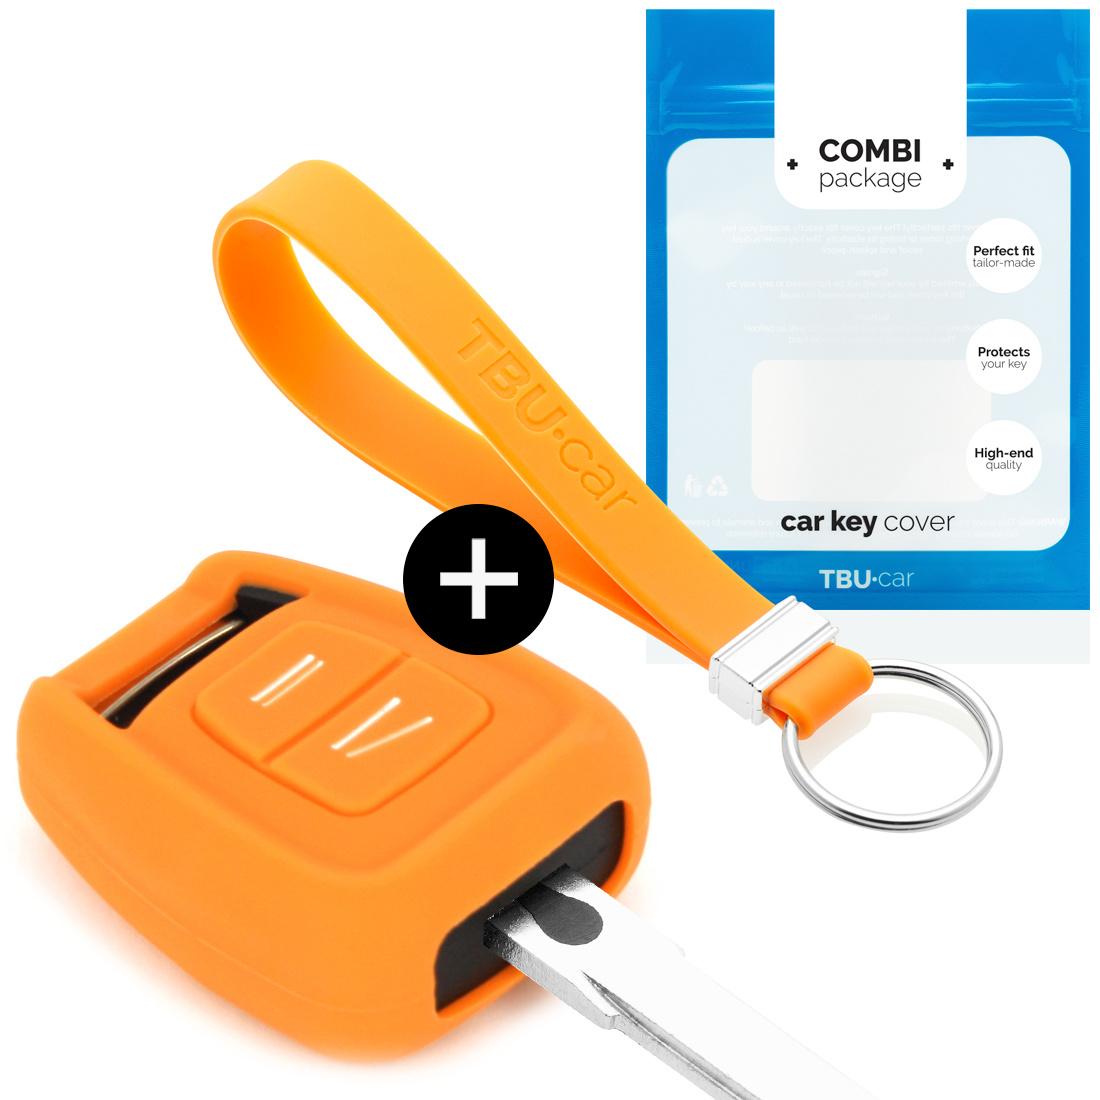 TBU car TBUCAR Autoschlüssel Hülle kompatibel mit Vauxhall 2 Tasten - Schutzhülle aus Silikon - Auto Schlüsselhülle Cover in Orange